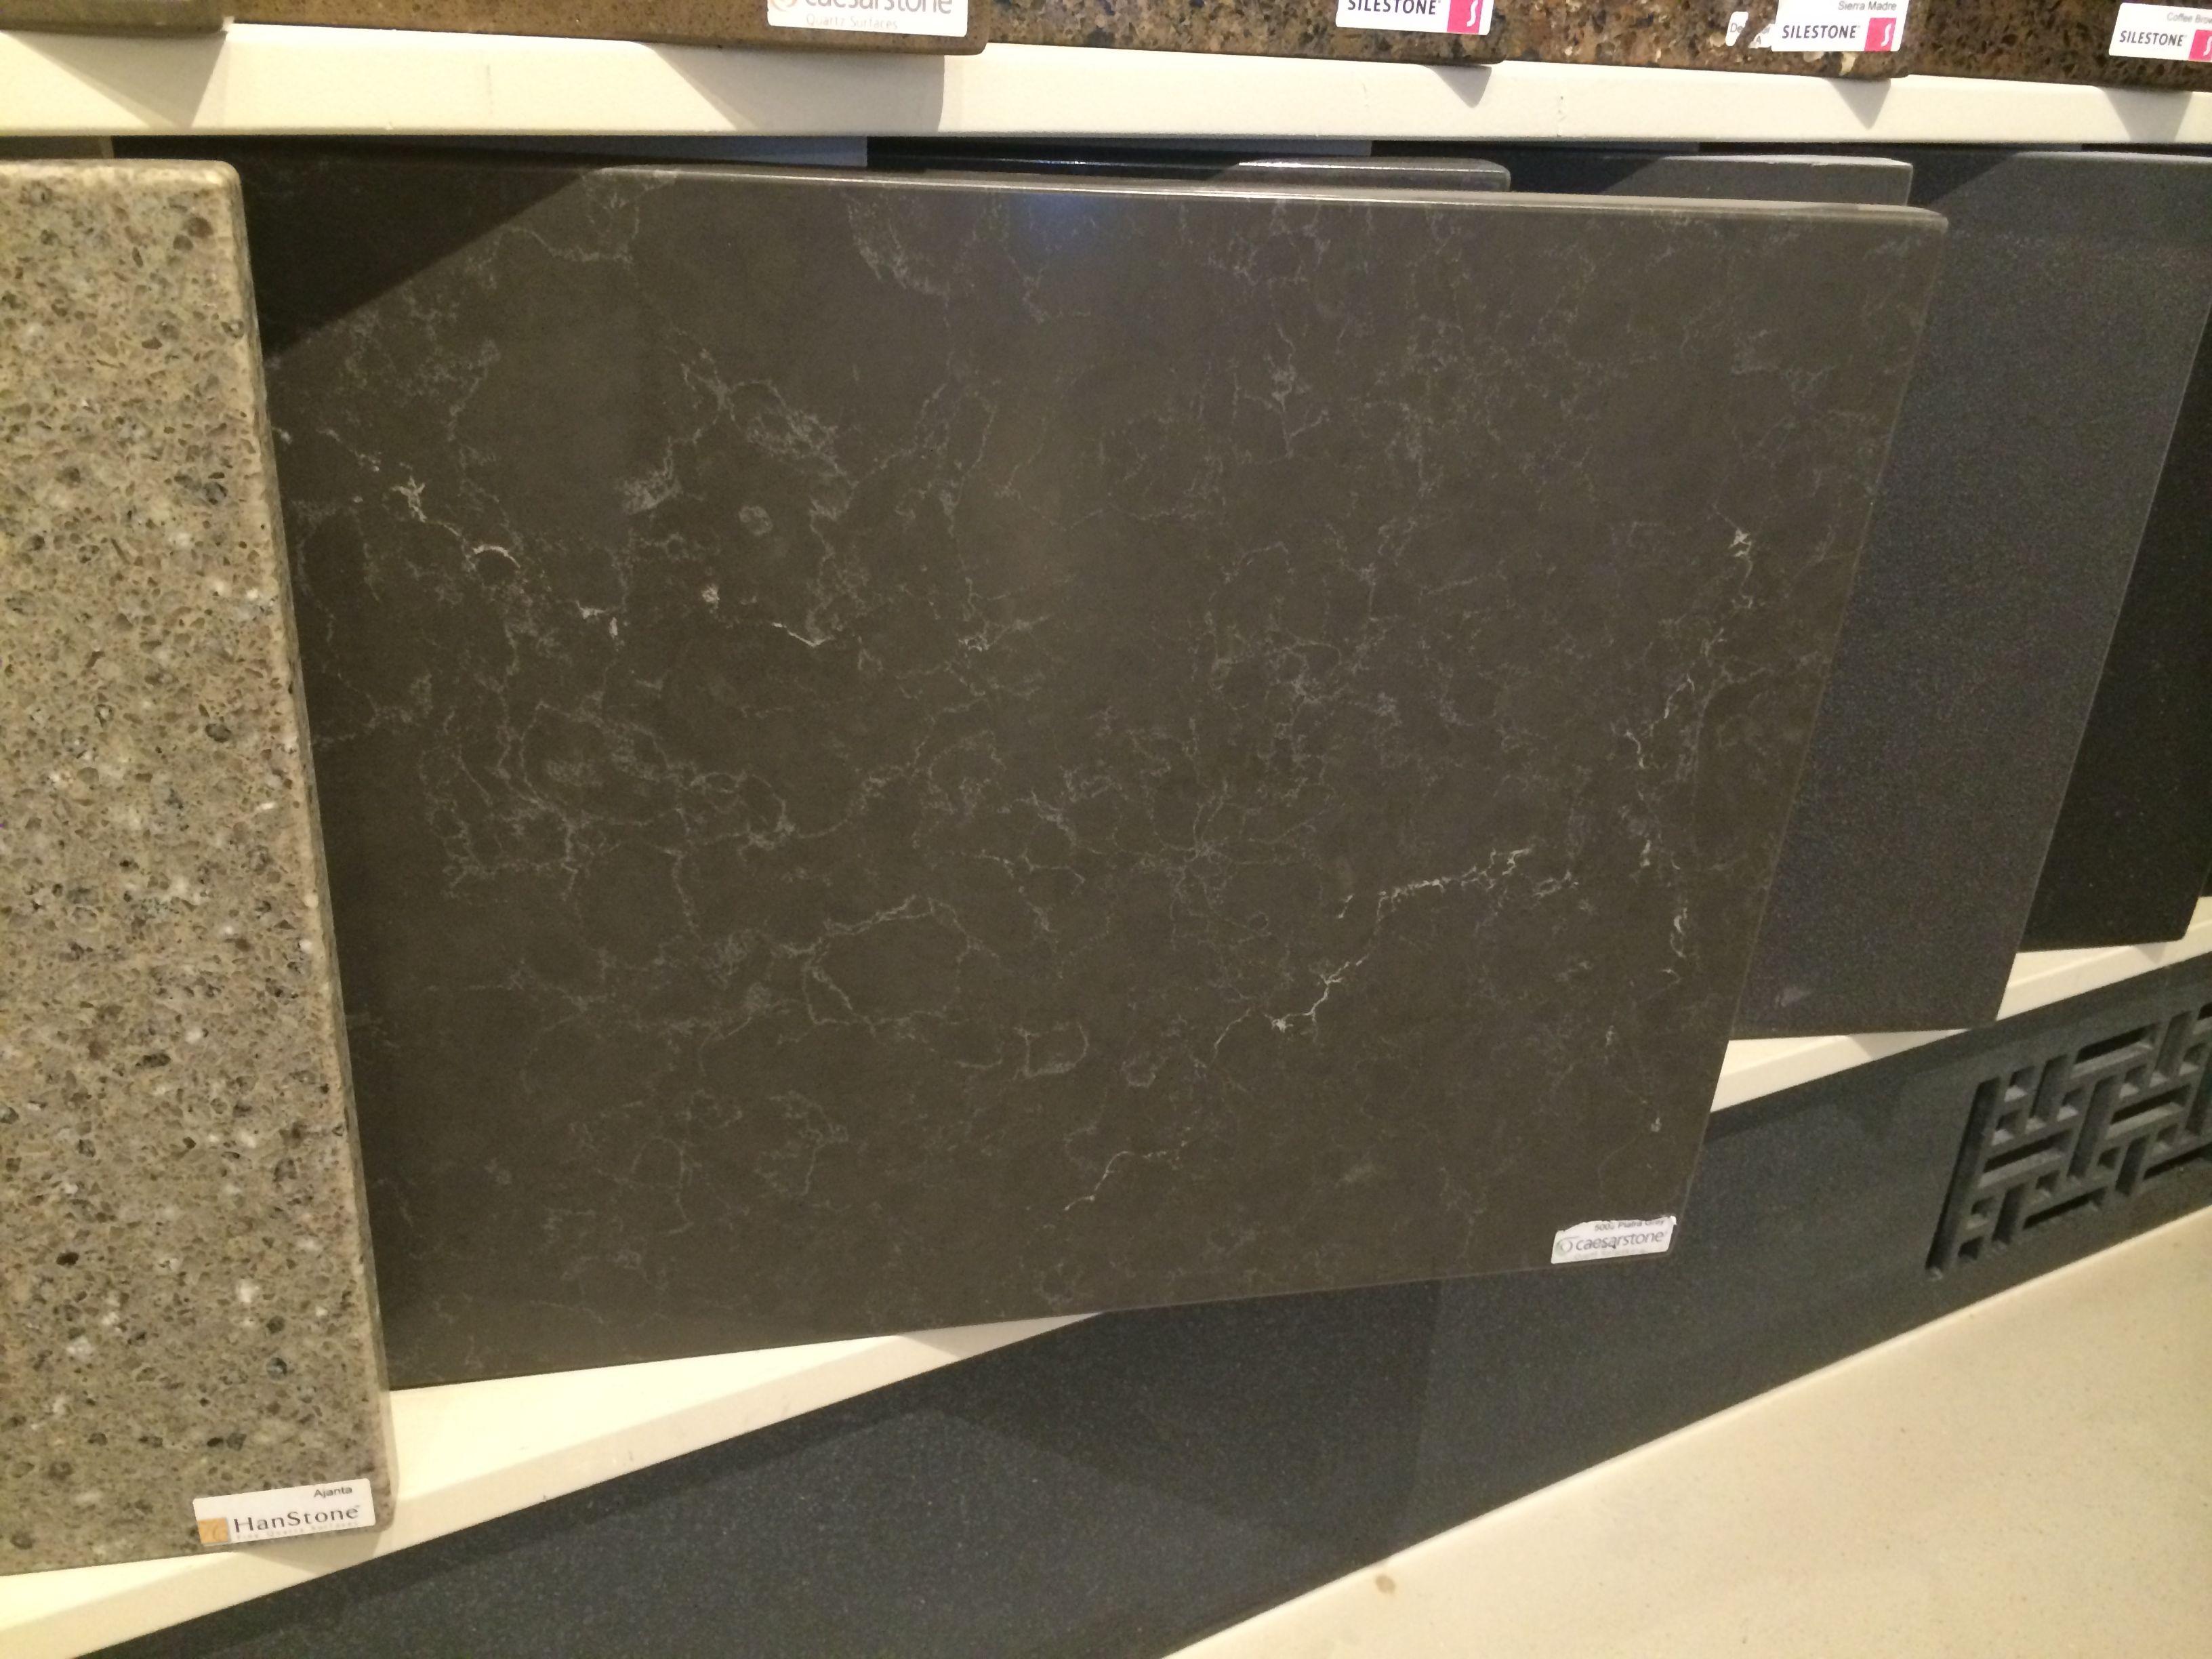 kashmir from to granite varies pin slab countertops sparkle countertop white quartz